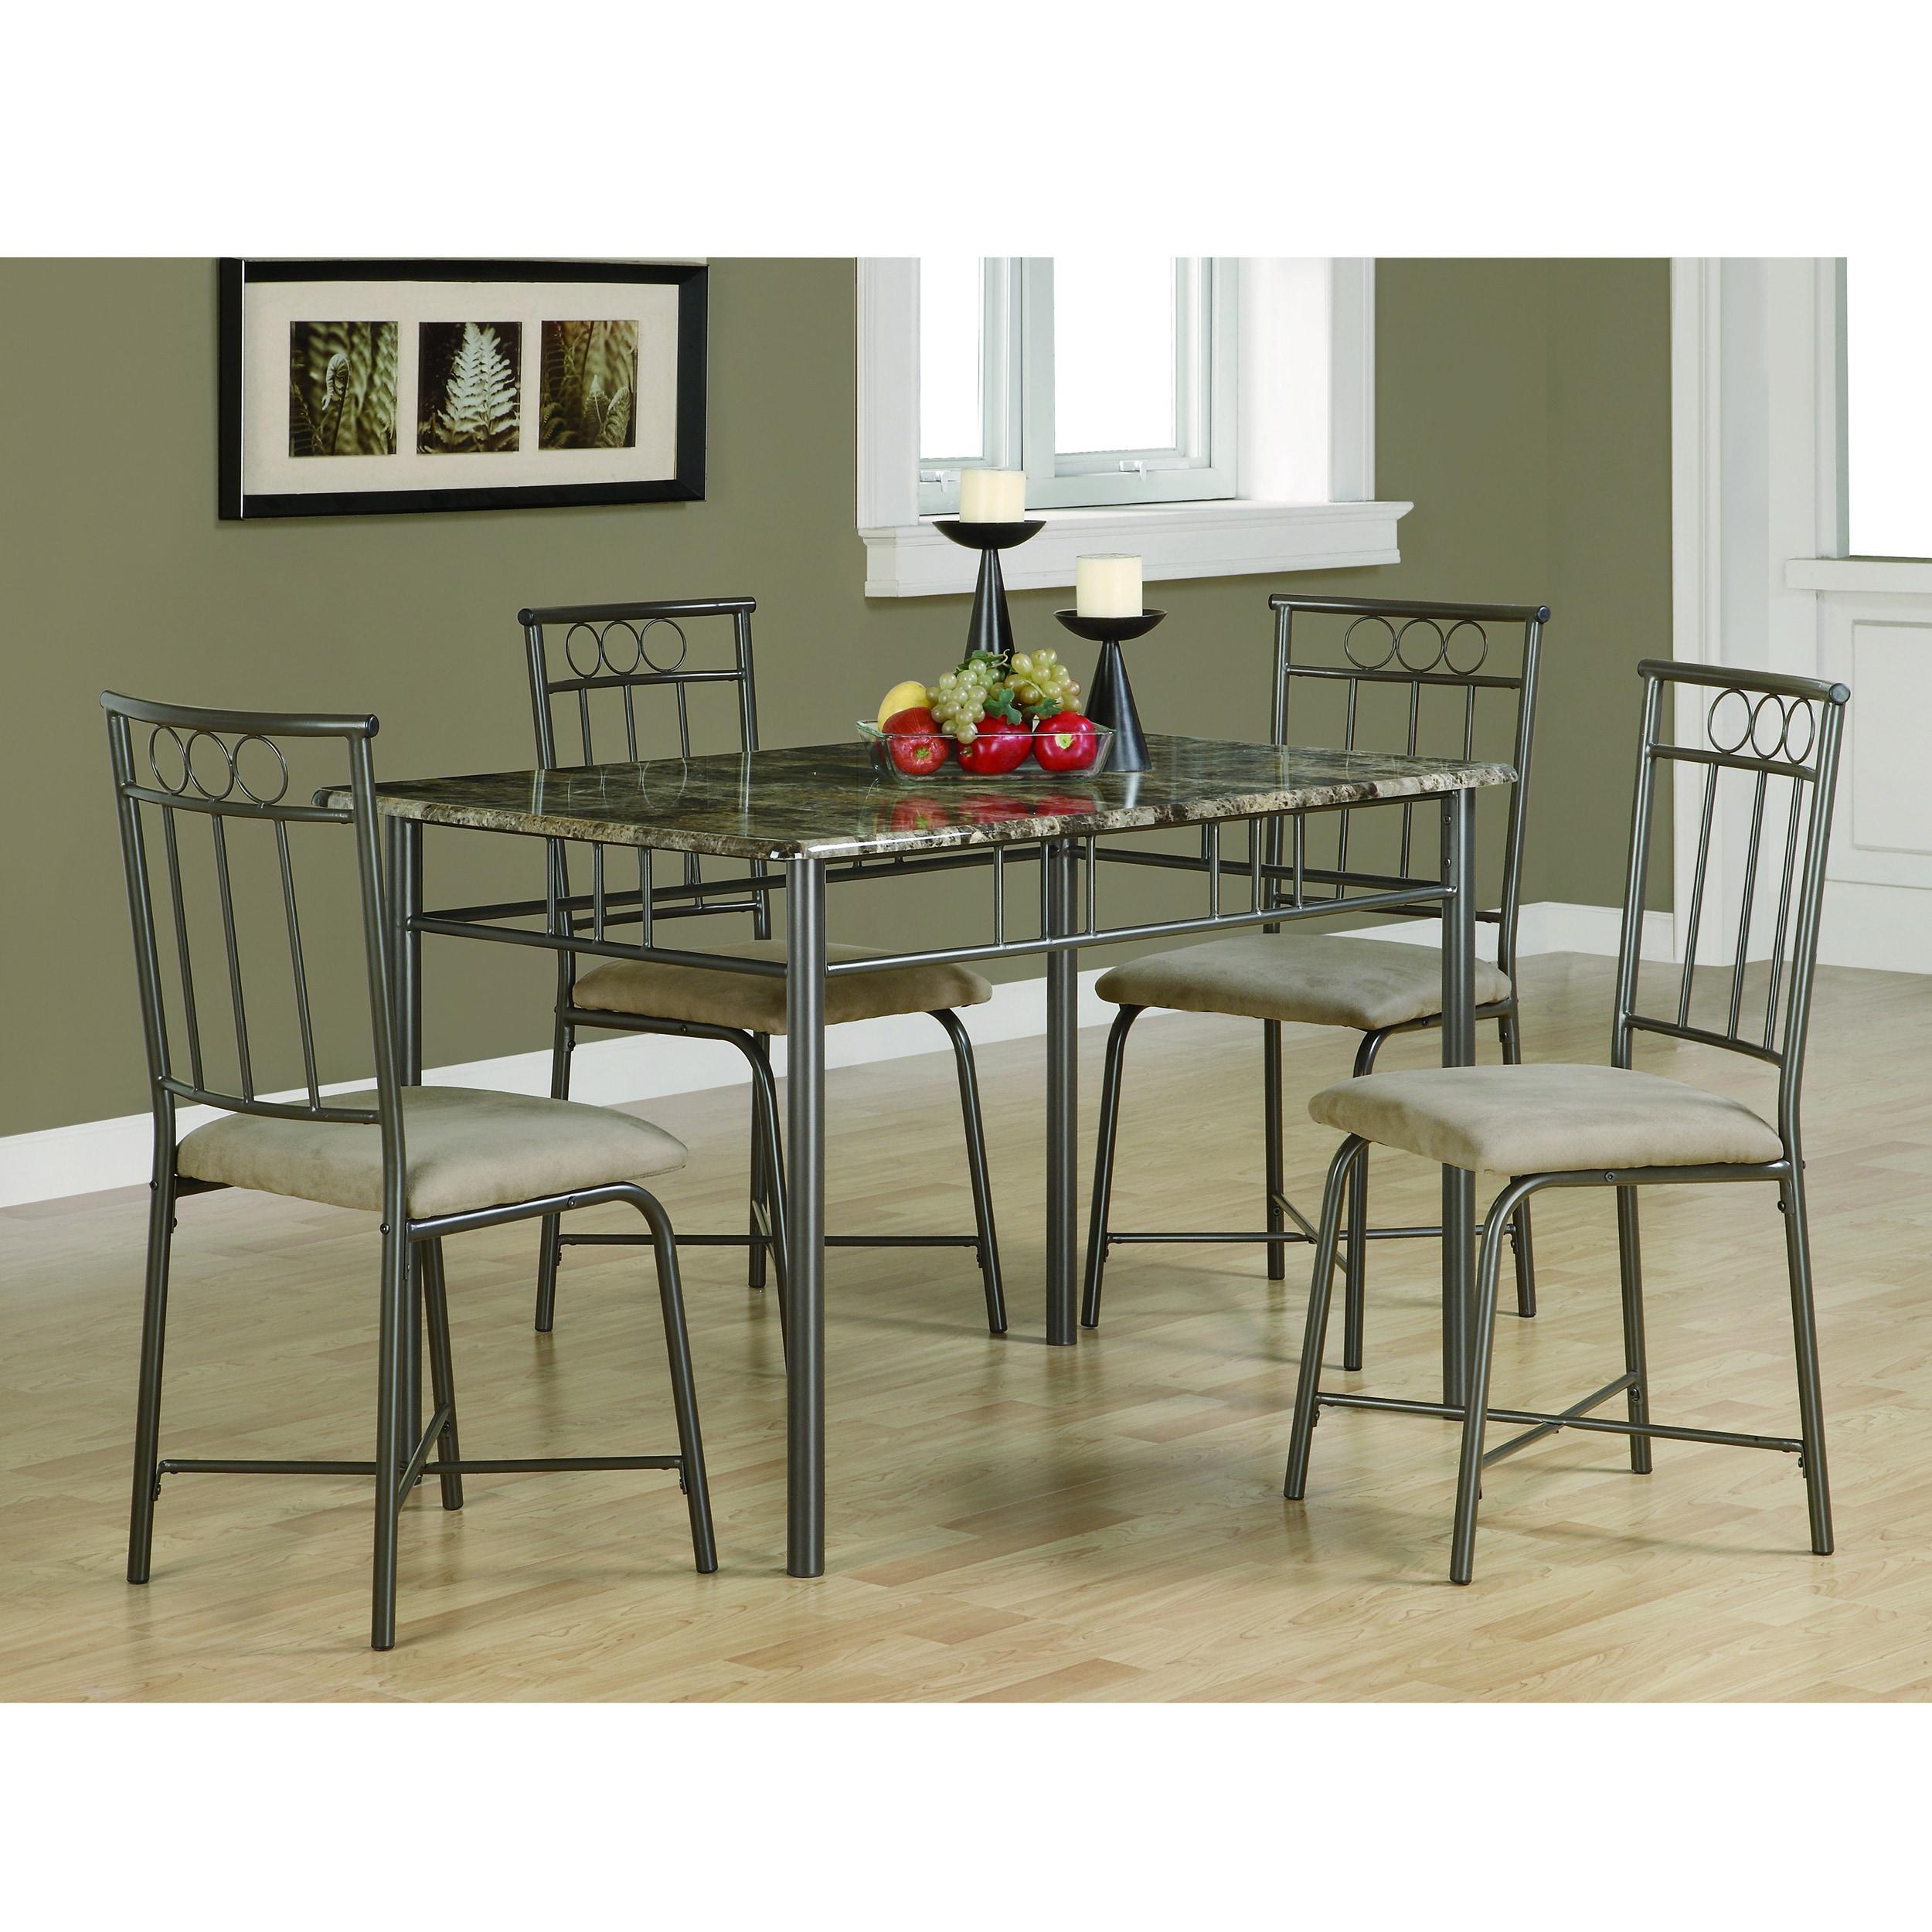 Coaster Furniture Dark Taupe/ Beige 5-piece Metal Dining ...